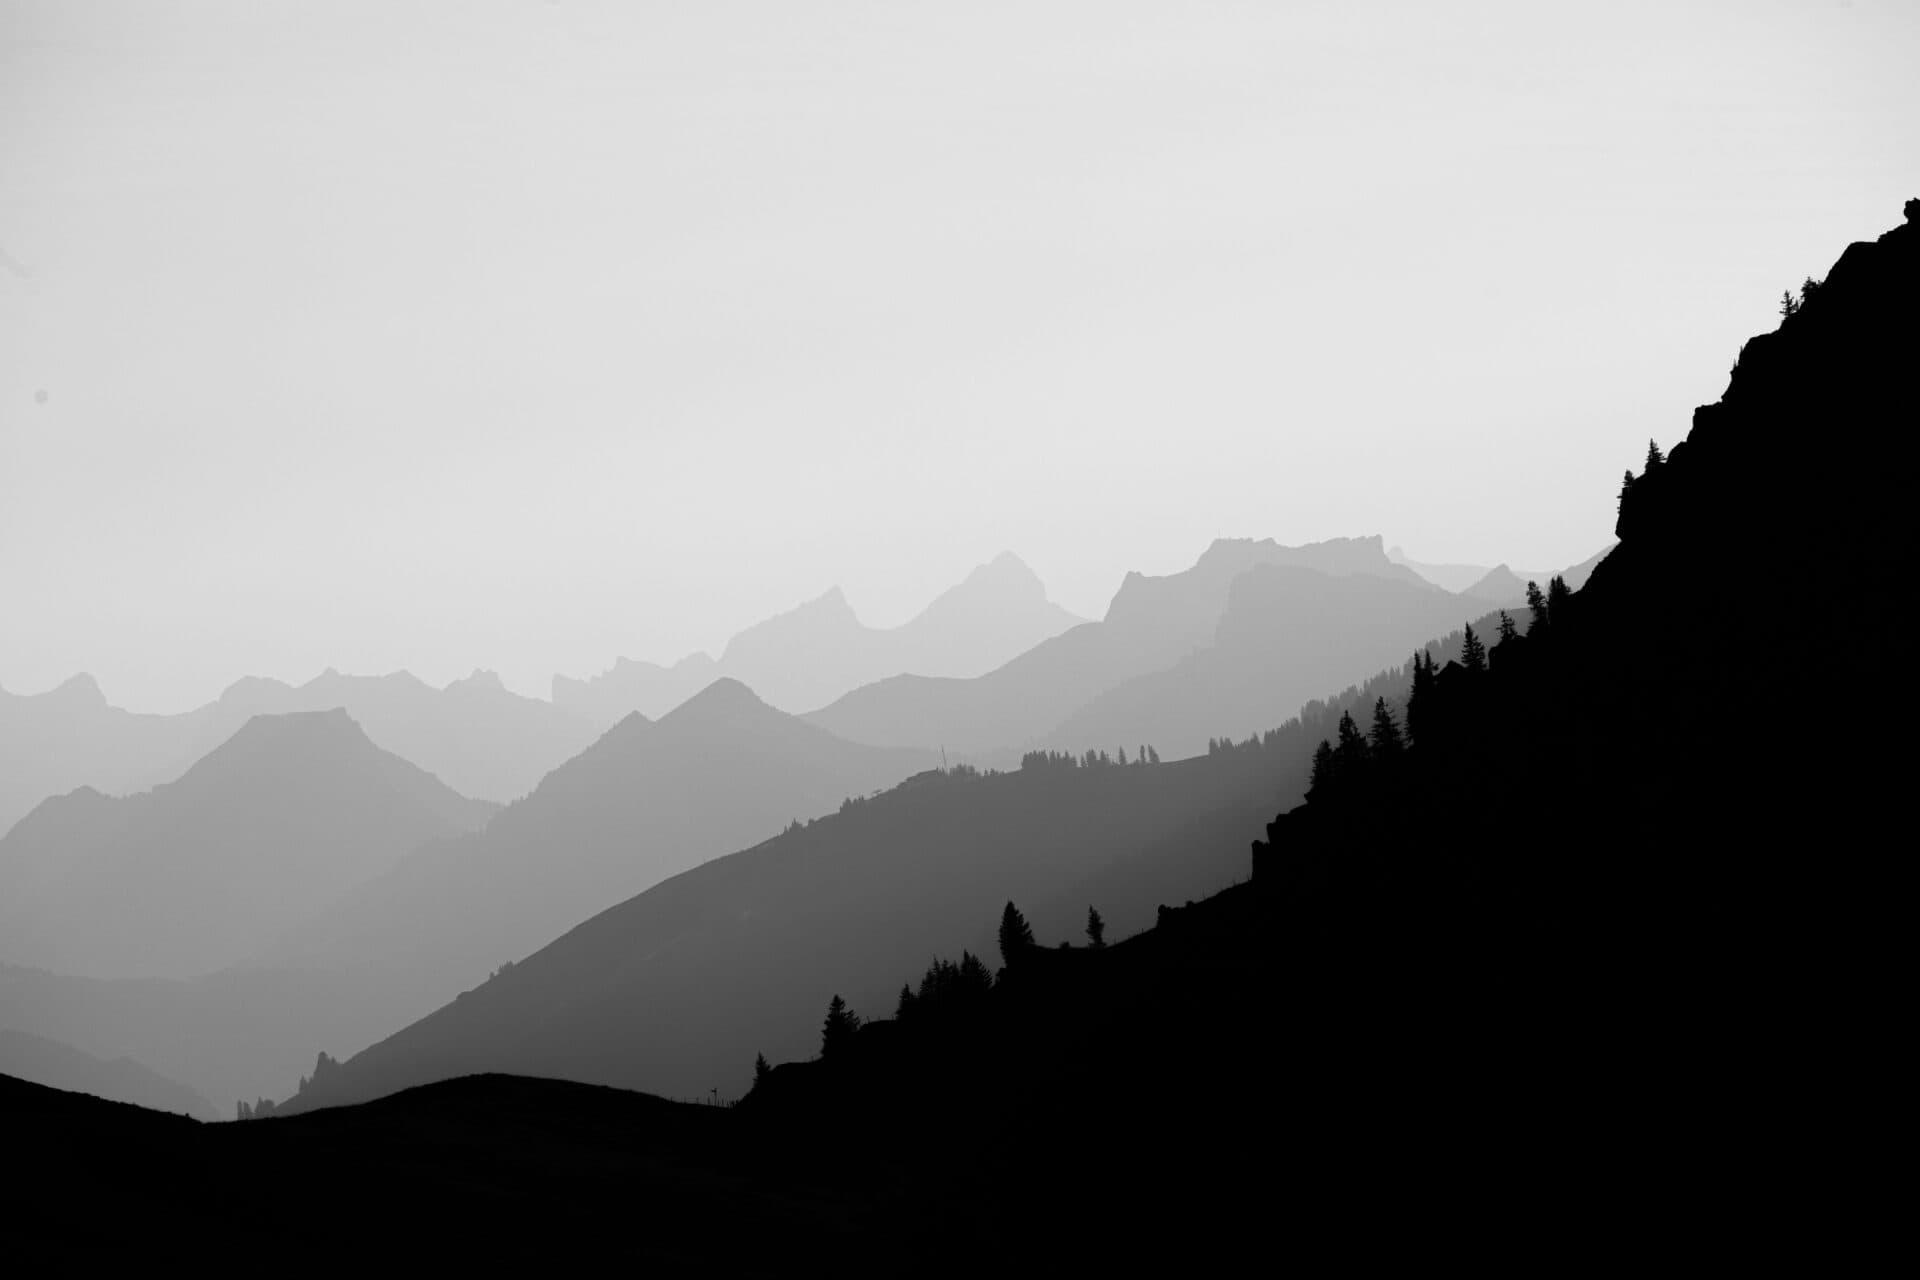 Jonas Schäfer Fotografie Spiez Berner Oberland Diemtigtal Landschaft Landschaftsfotografie Berge